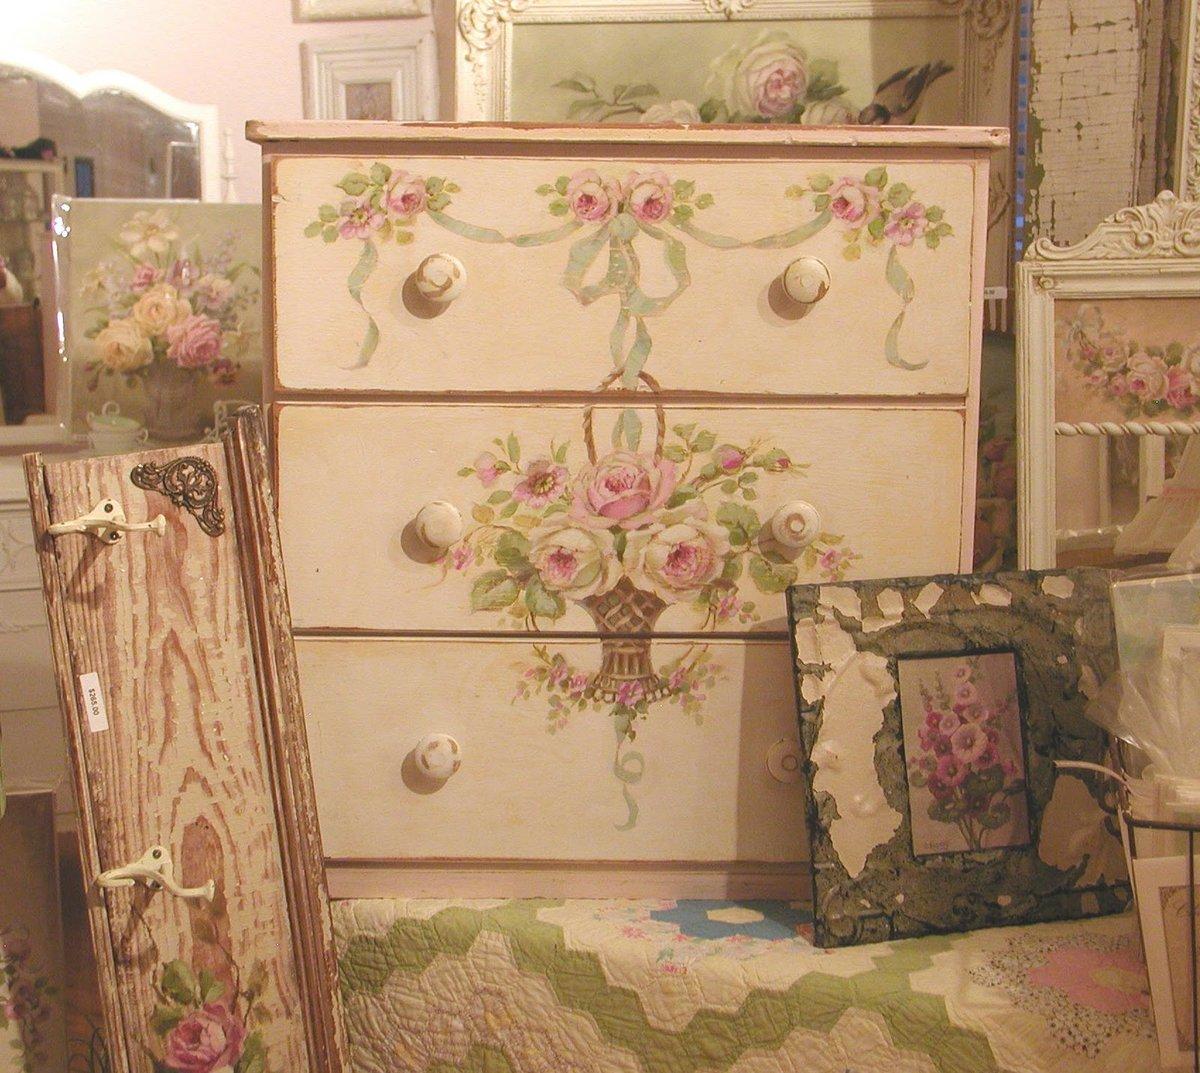 картинки для декупажа на мебели течении праздника